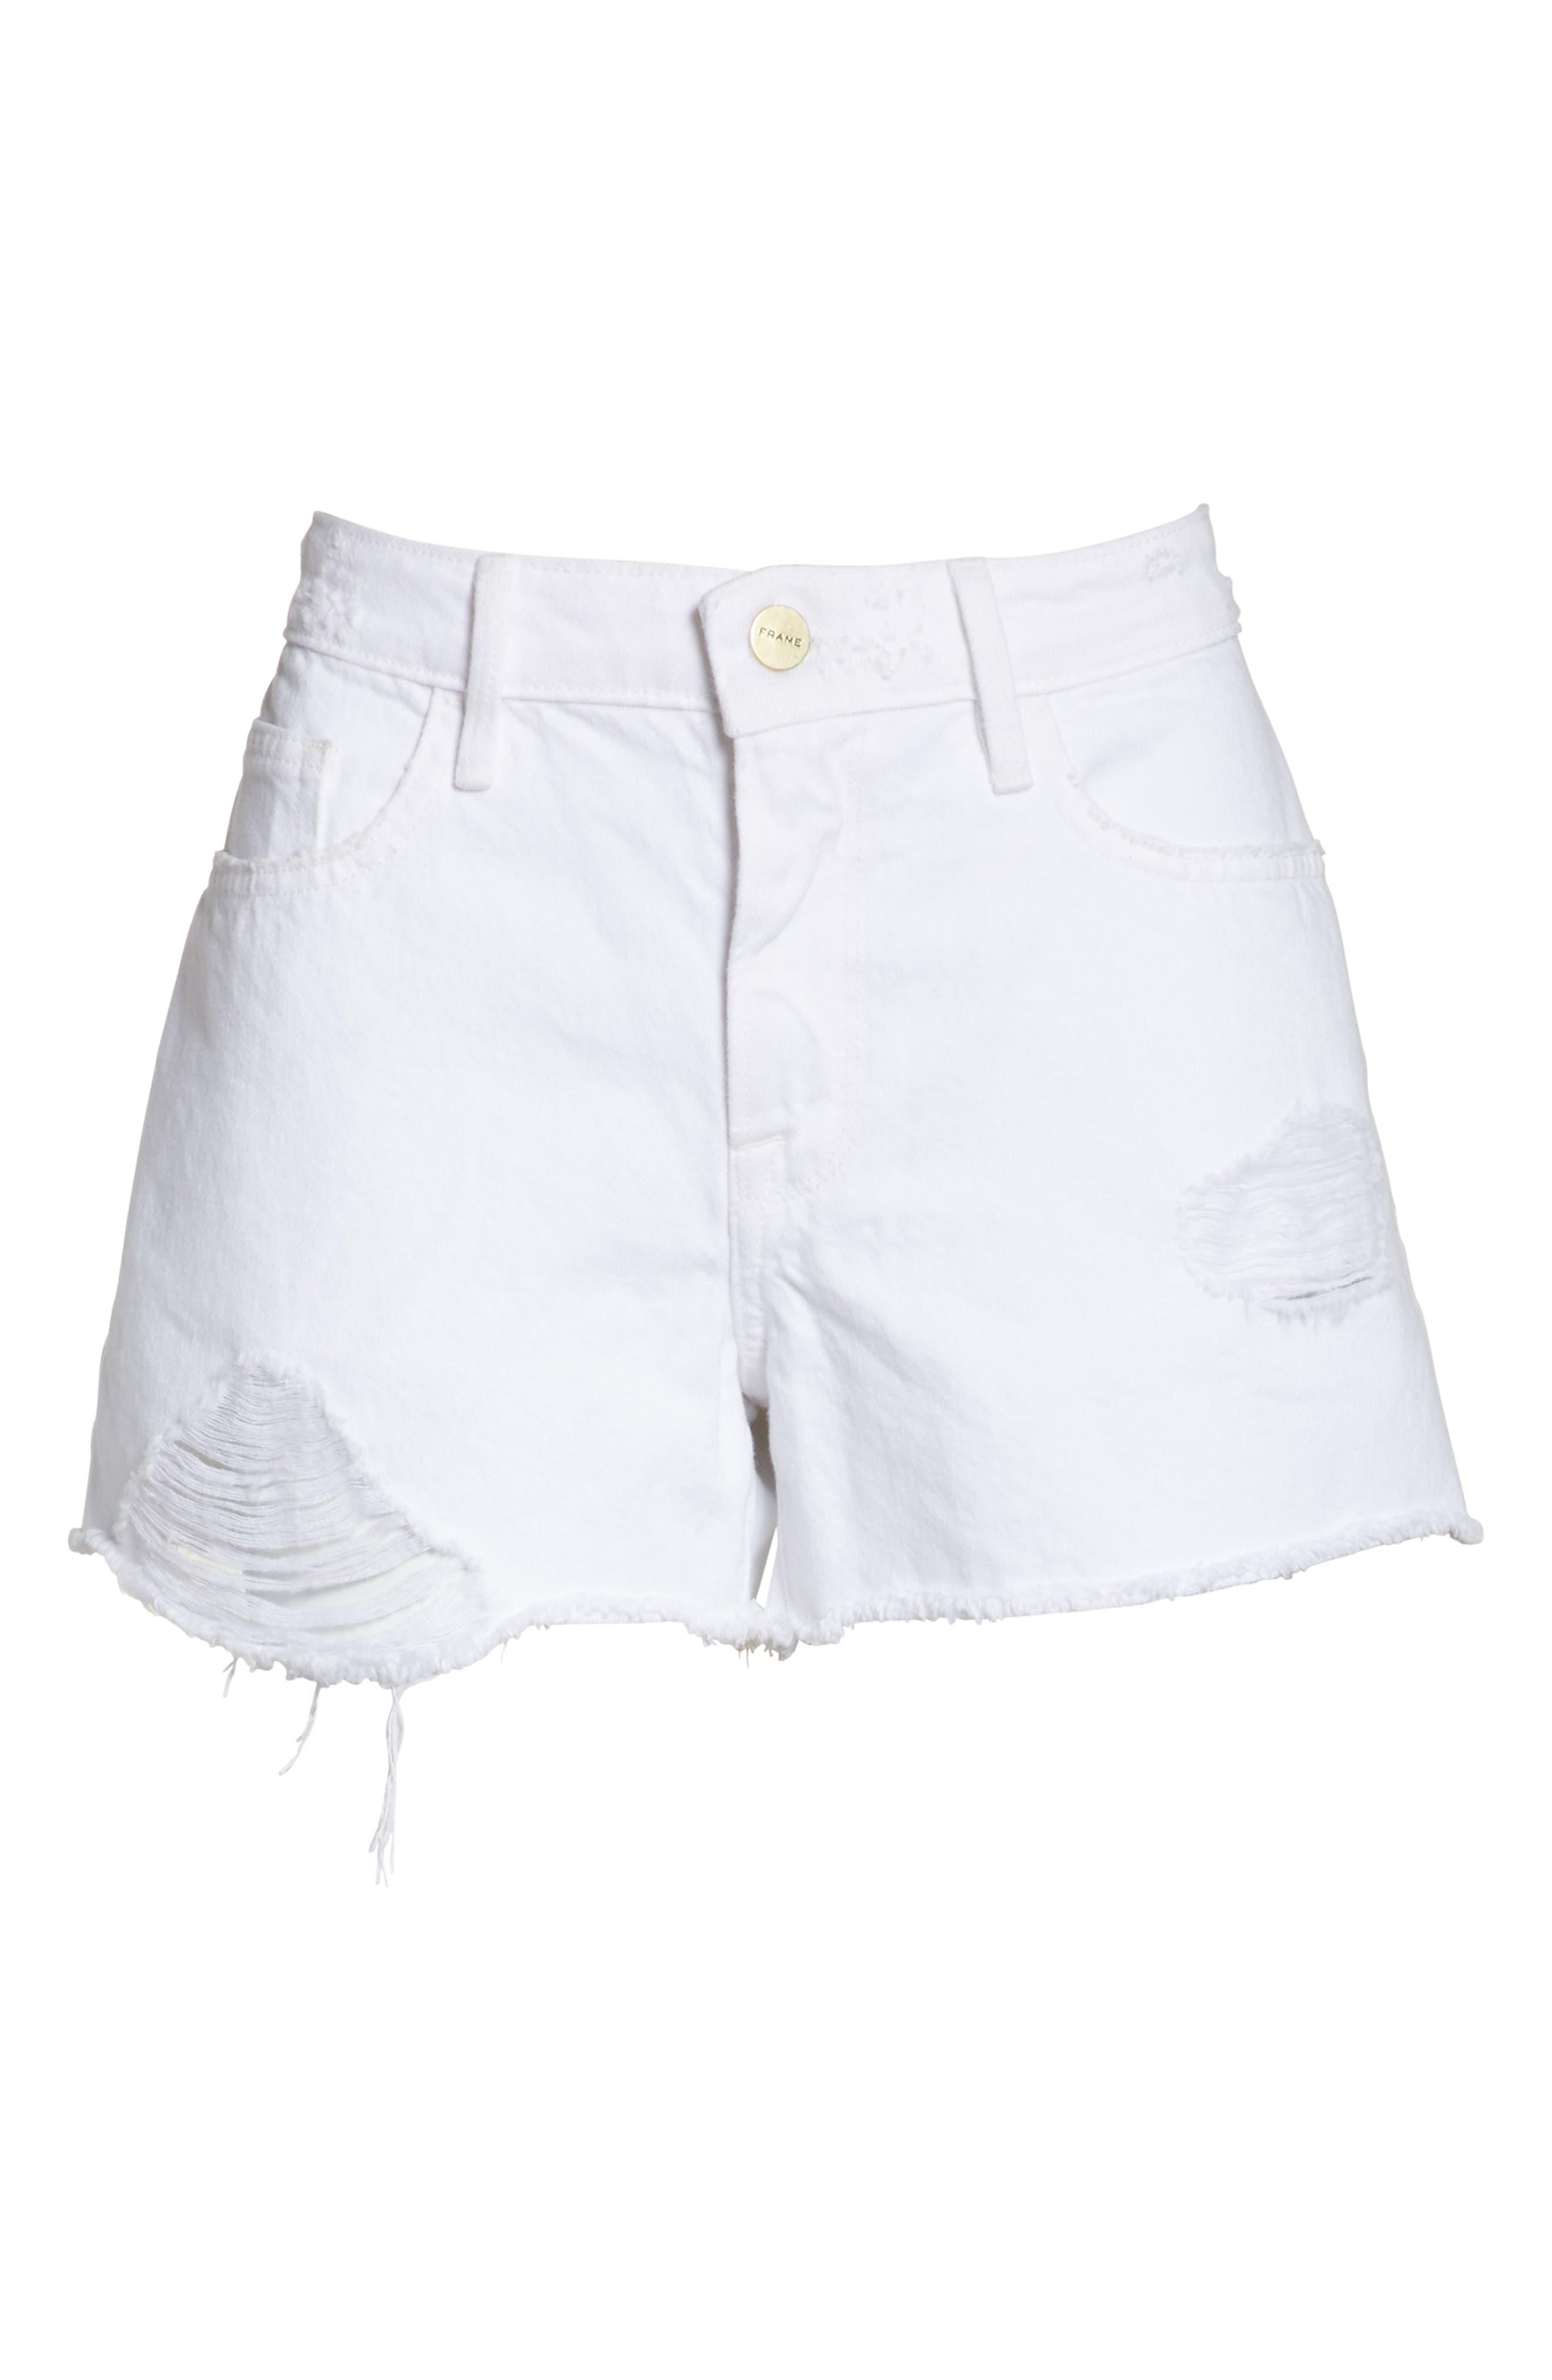 Le Grand Garçon Cutoff Denim Shorts,                             Alternate thumbnail 6, color,                             150